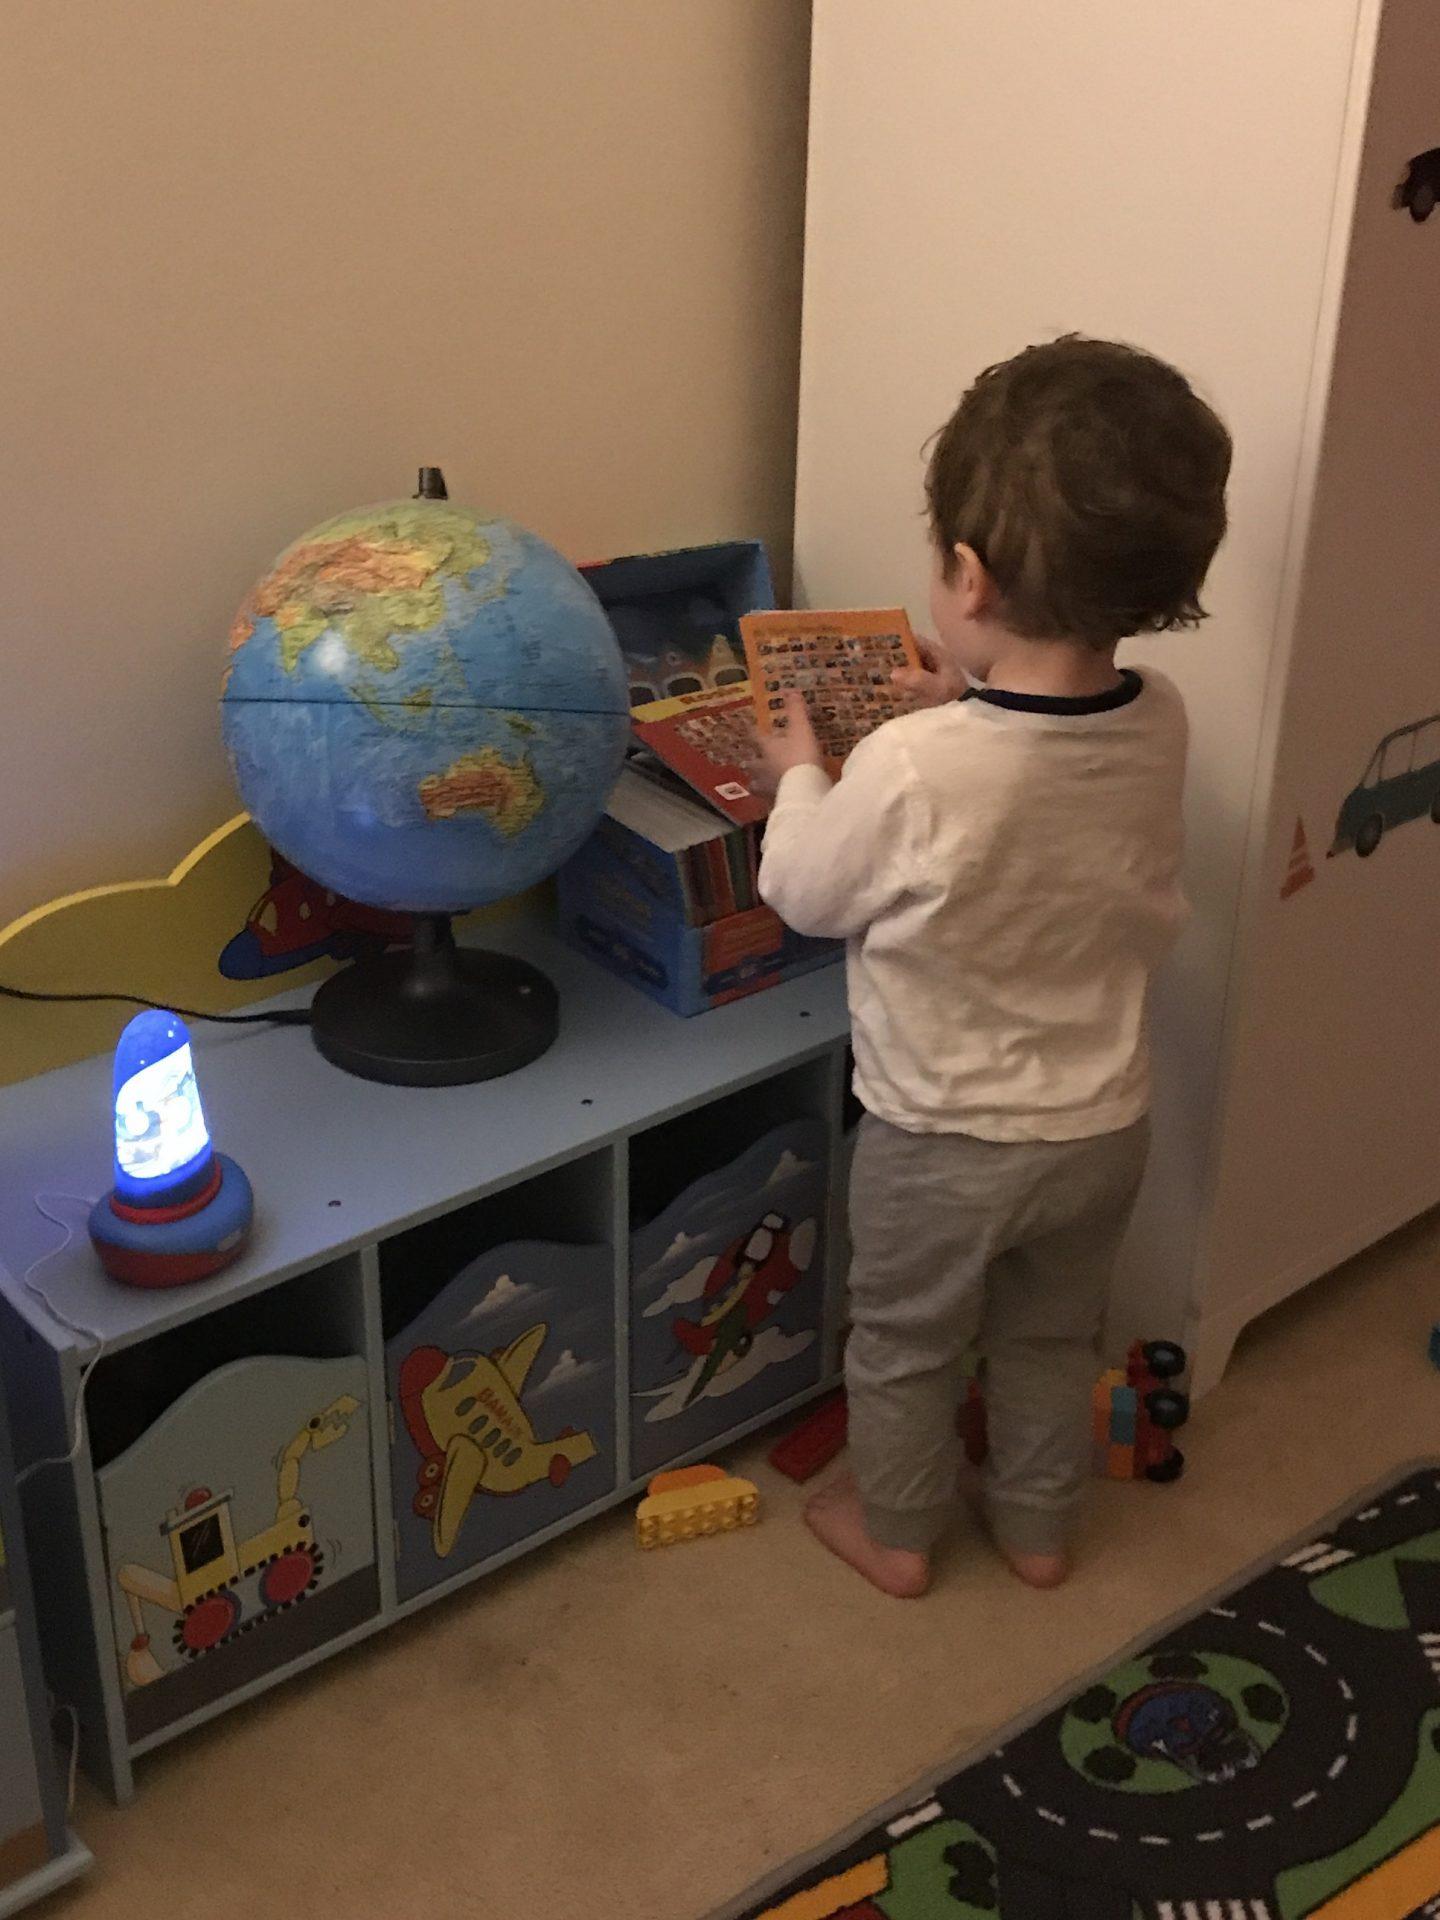 choosing a bedtime story